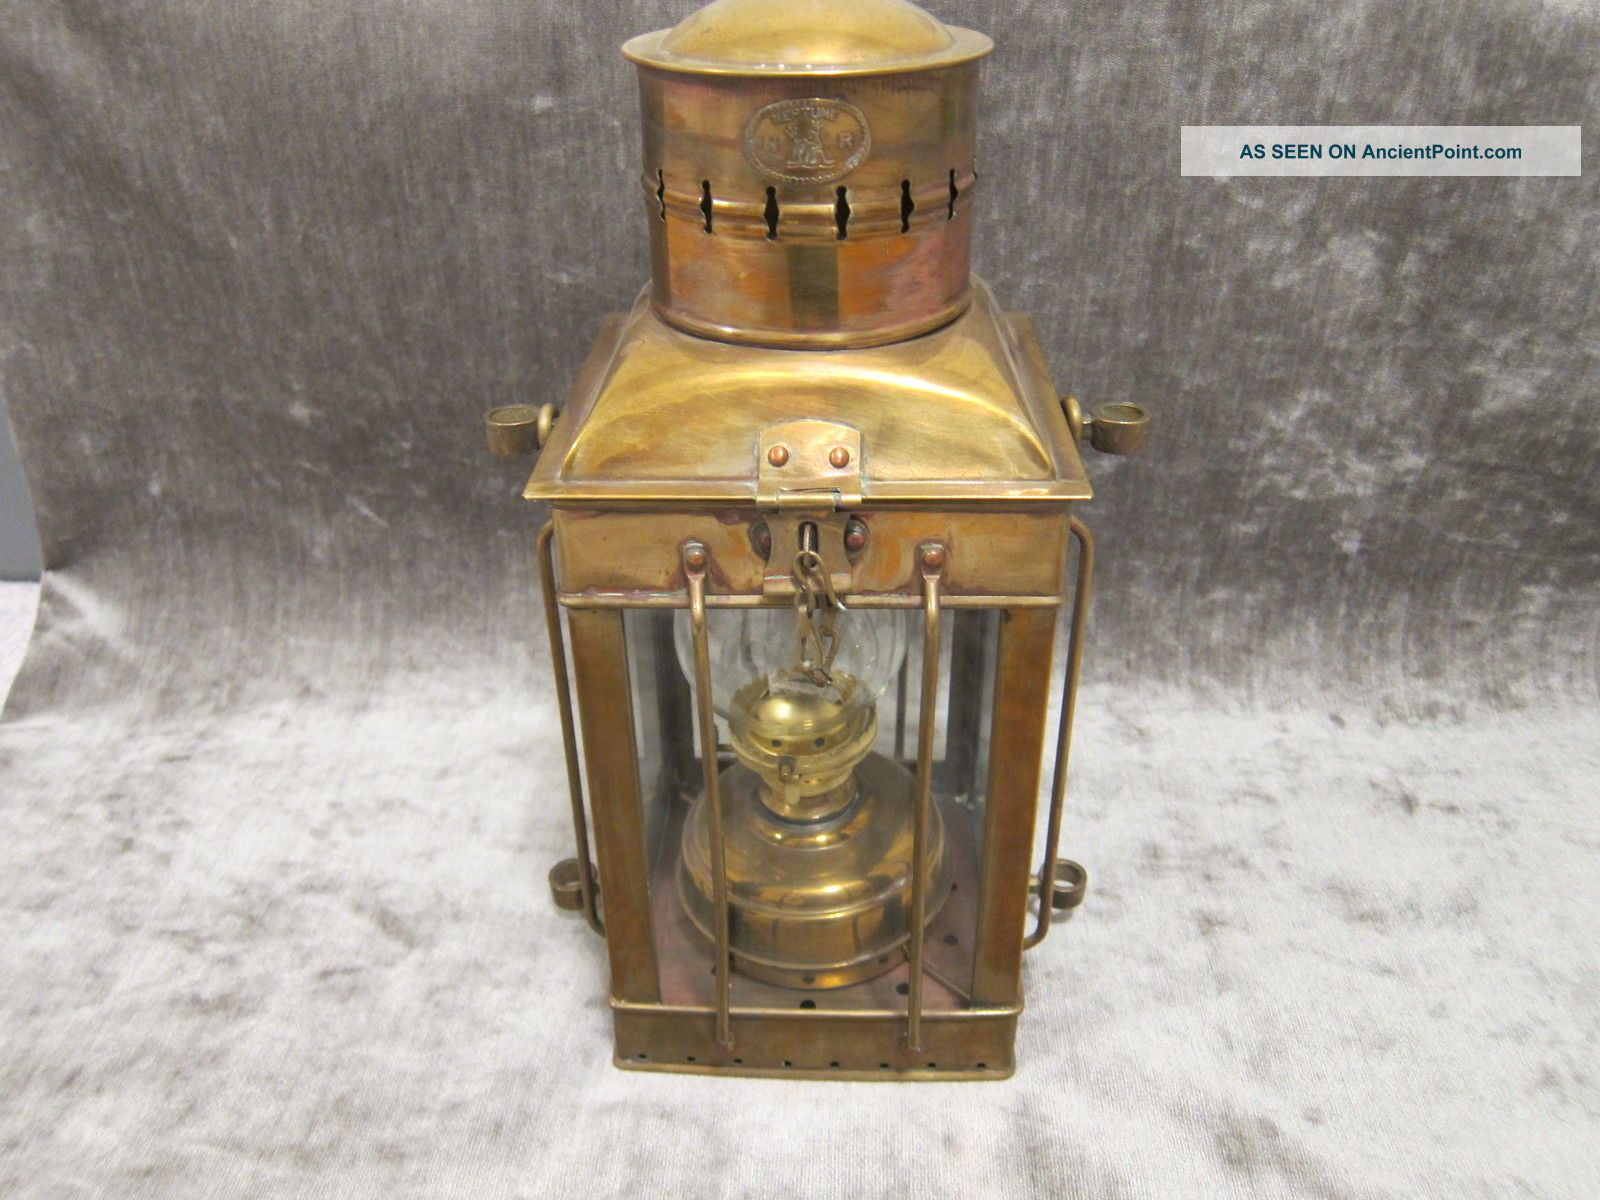 Antique Large & Heavy 1920 ' S Neptune N R Ship Oil Lantern Brass & Copper Lamps & Lighting photo